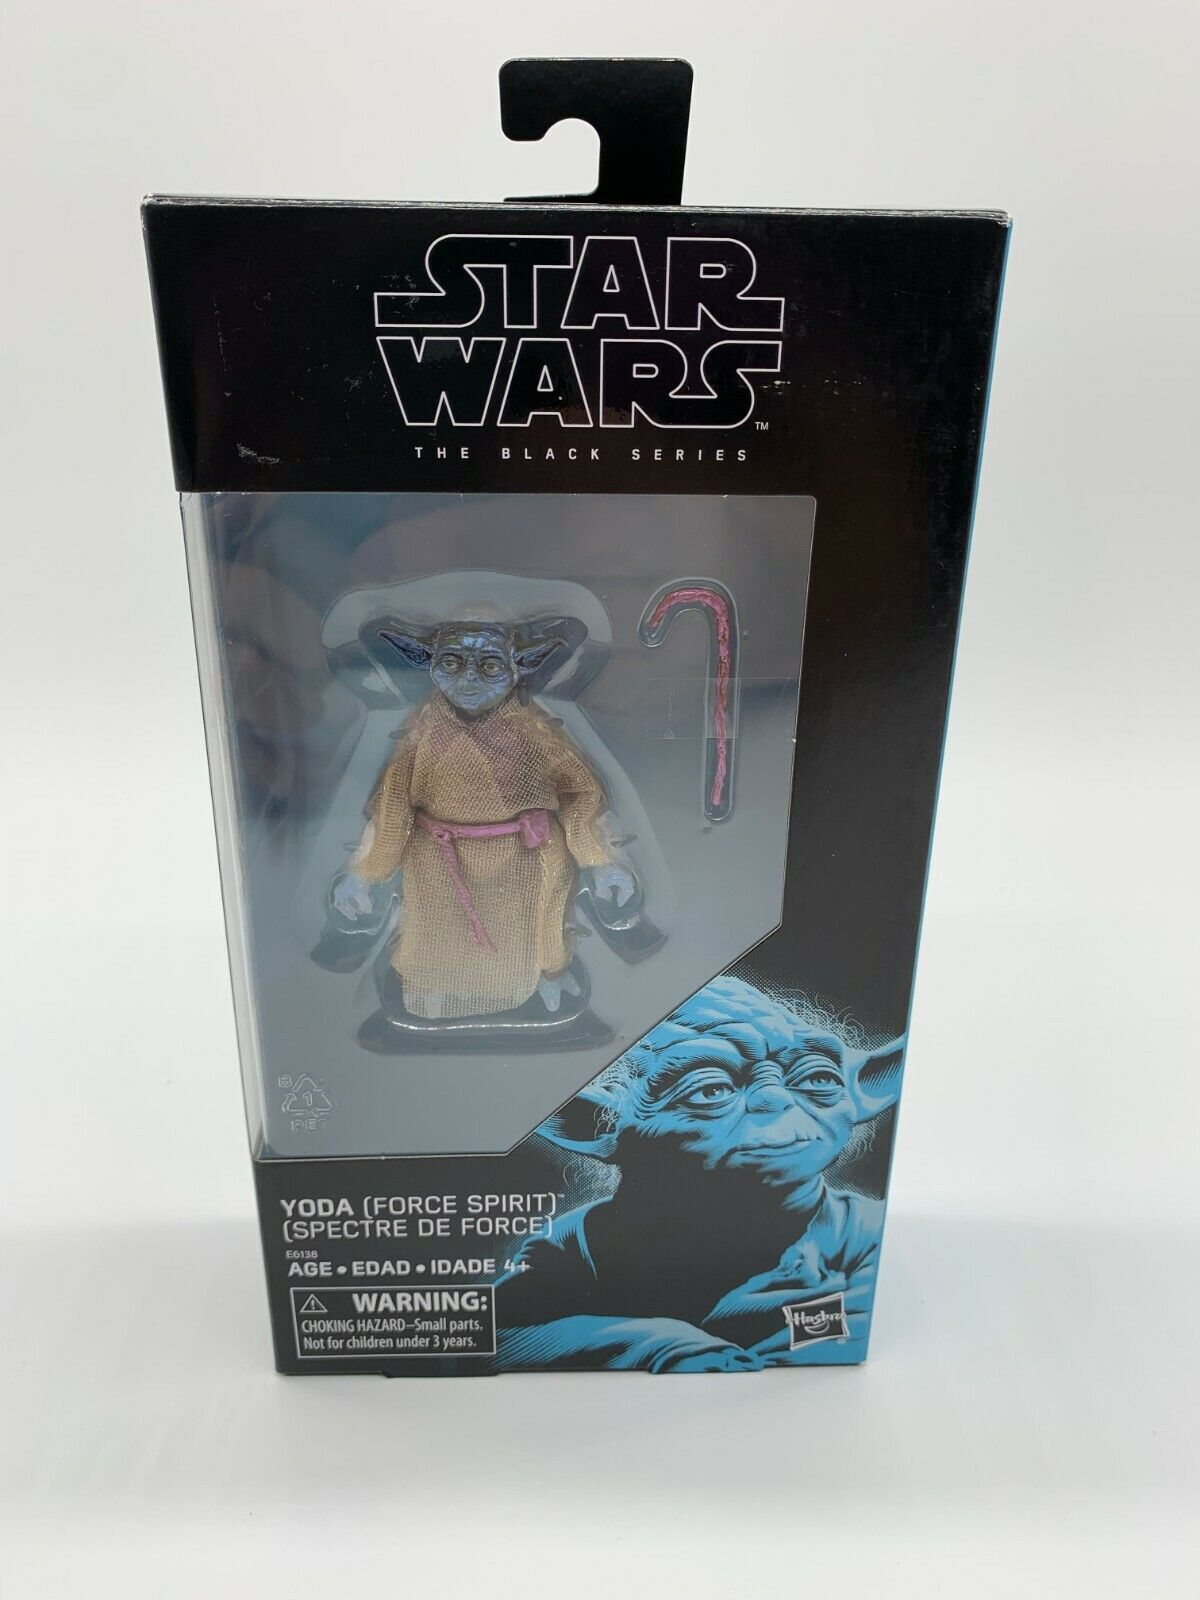 Hasbro Star Wars The Black Series Yoda in stock Spectre De Force Force Spirit